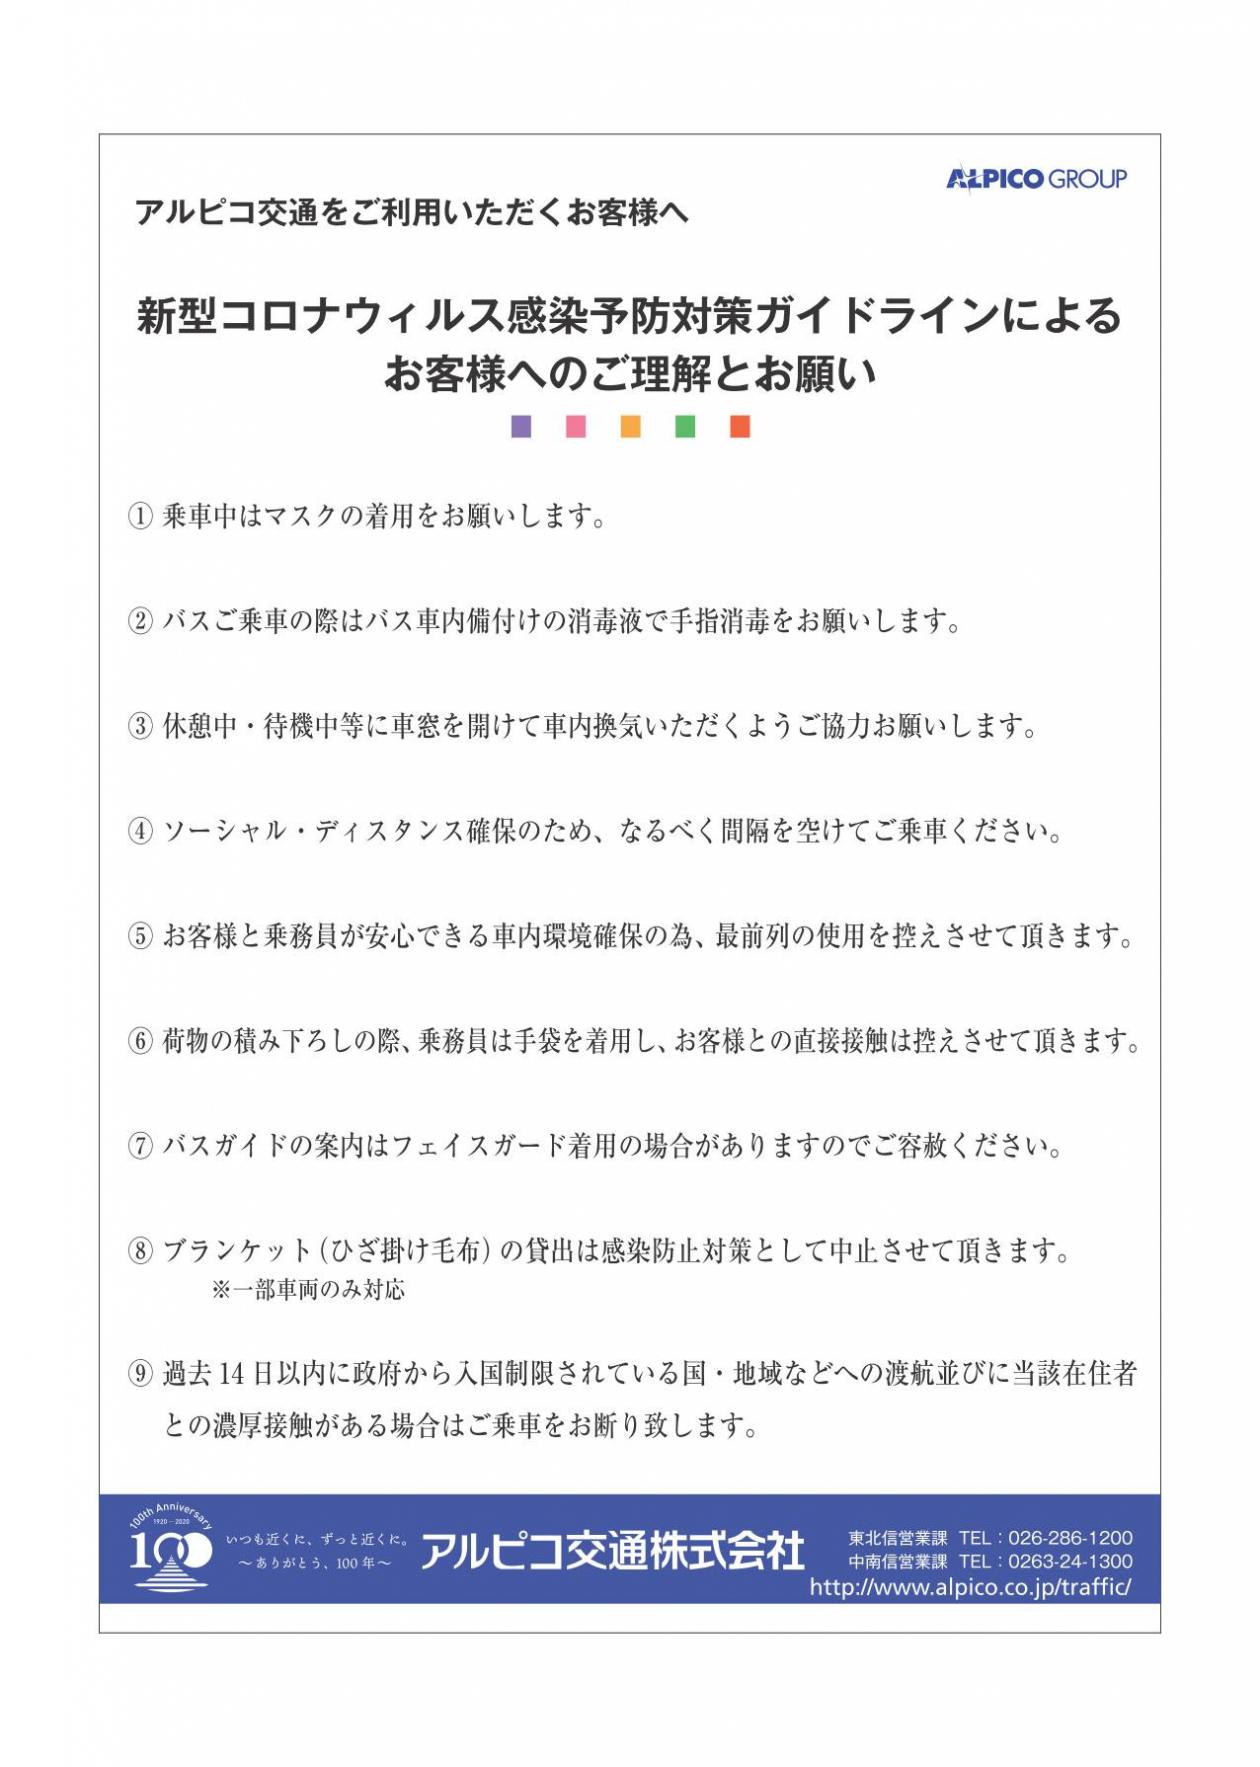 https://www.alpico.co.jp/traffic/datas/cache/images/2020/06/10/1260x_ea1e9d427fb5664c32c517a73e421e58_fcbc9411f054fce578e28ba7ad512328d9d29615.jpg